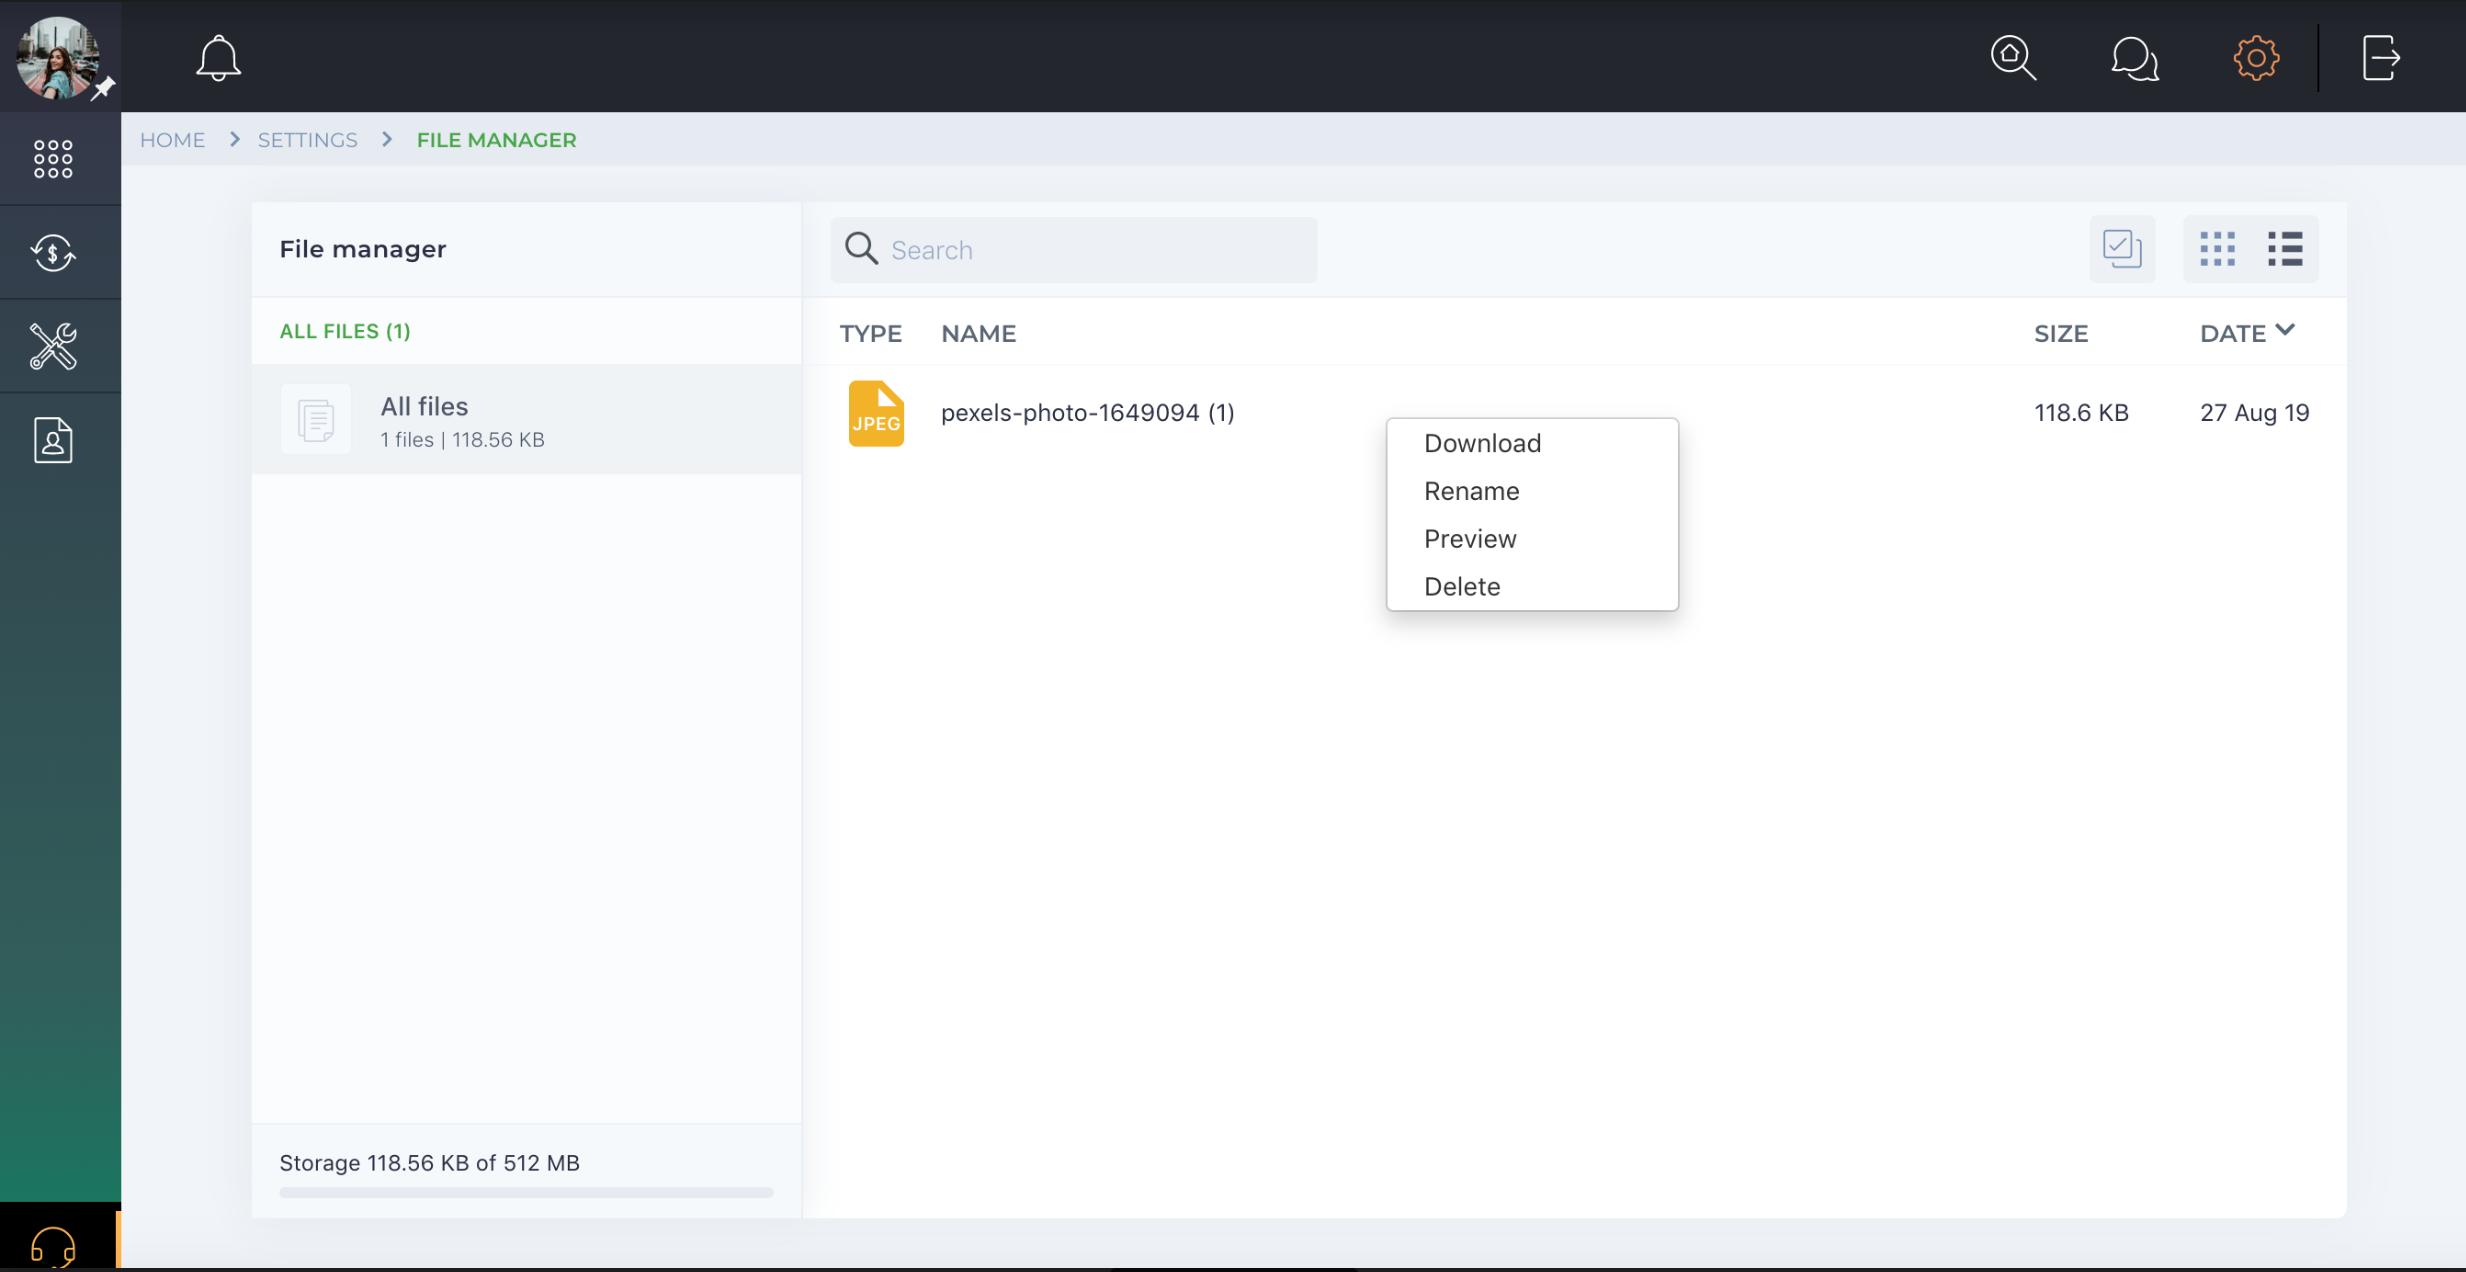 How do I manage uploaded files?